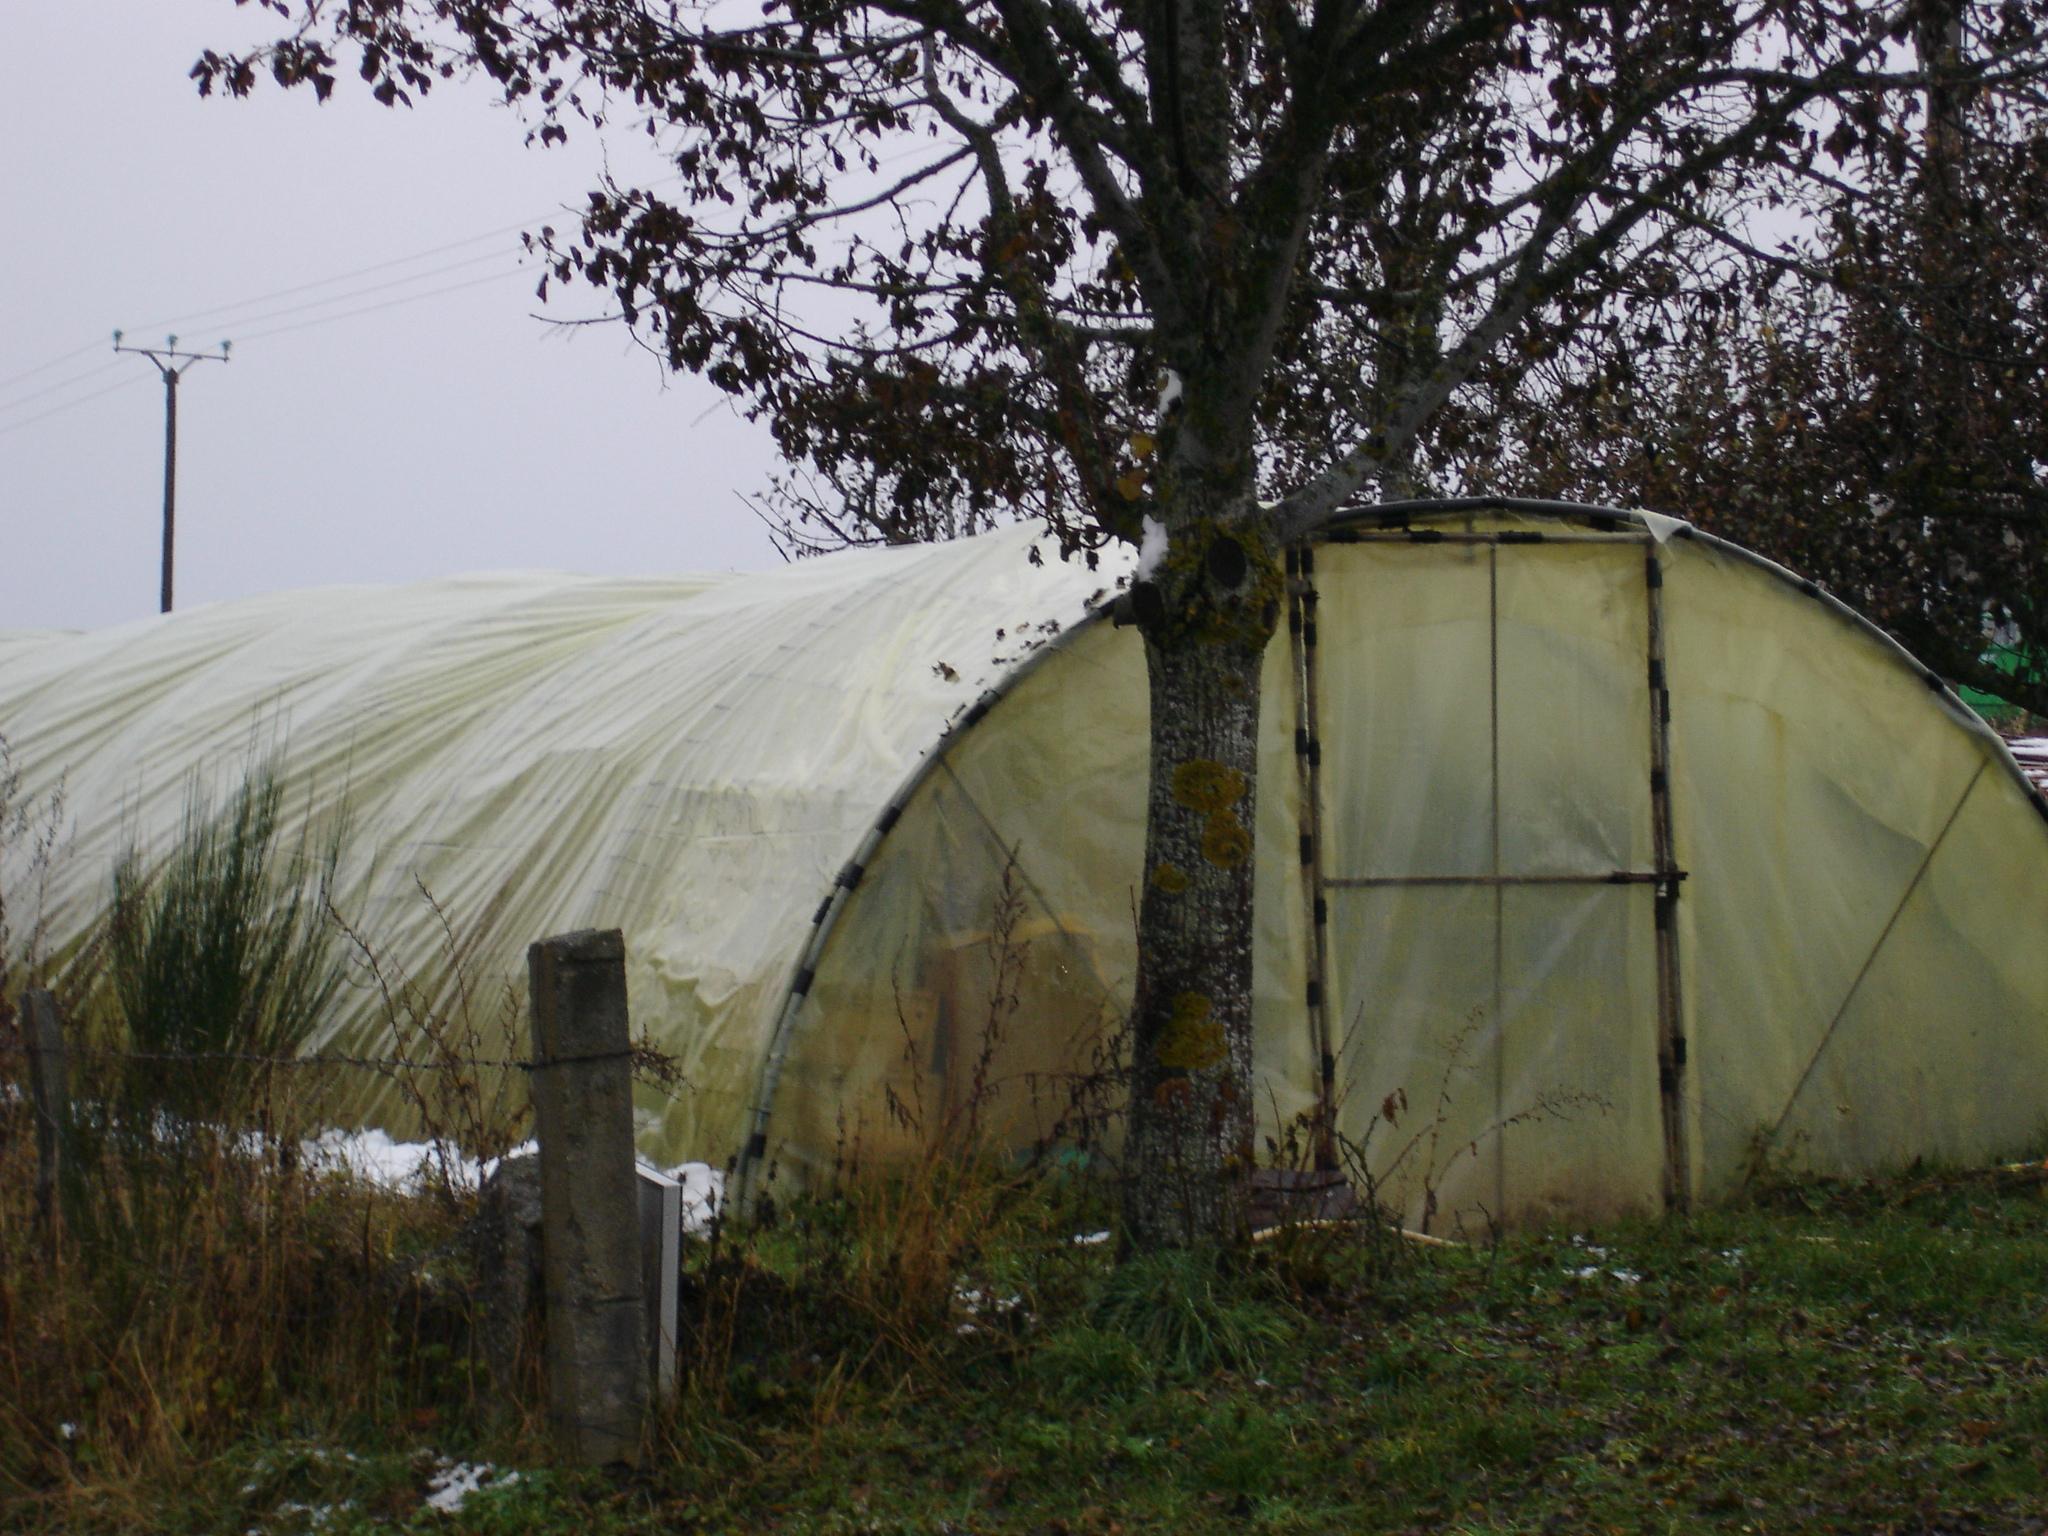 Une Serre Au Jardin Potager | Jardinage, Potager, Jardin encequiconcerne Serre Jardin Occasion